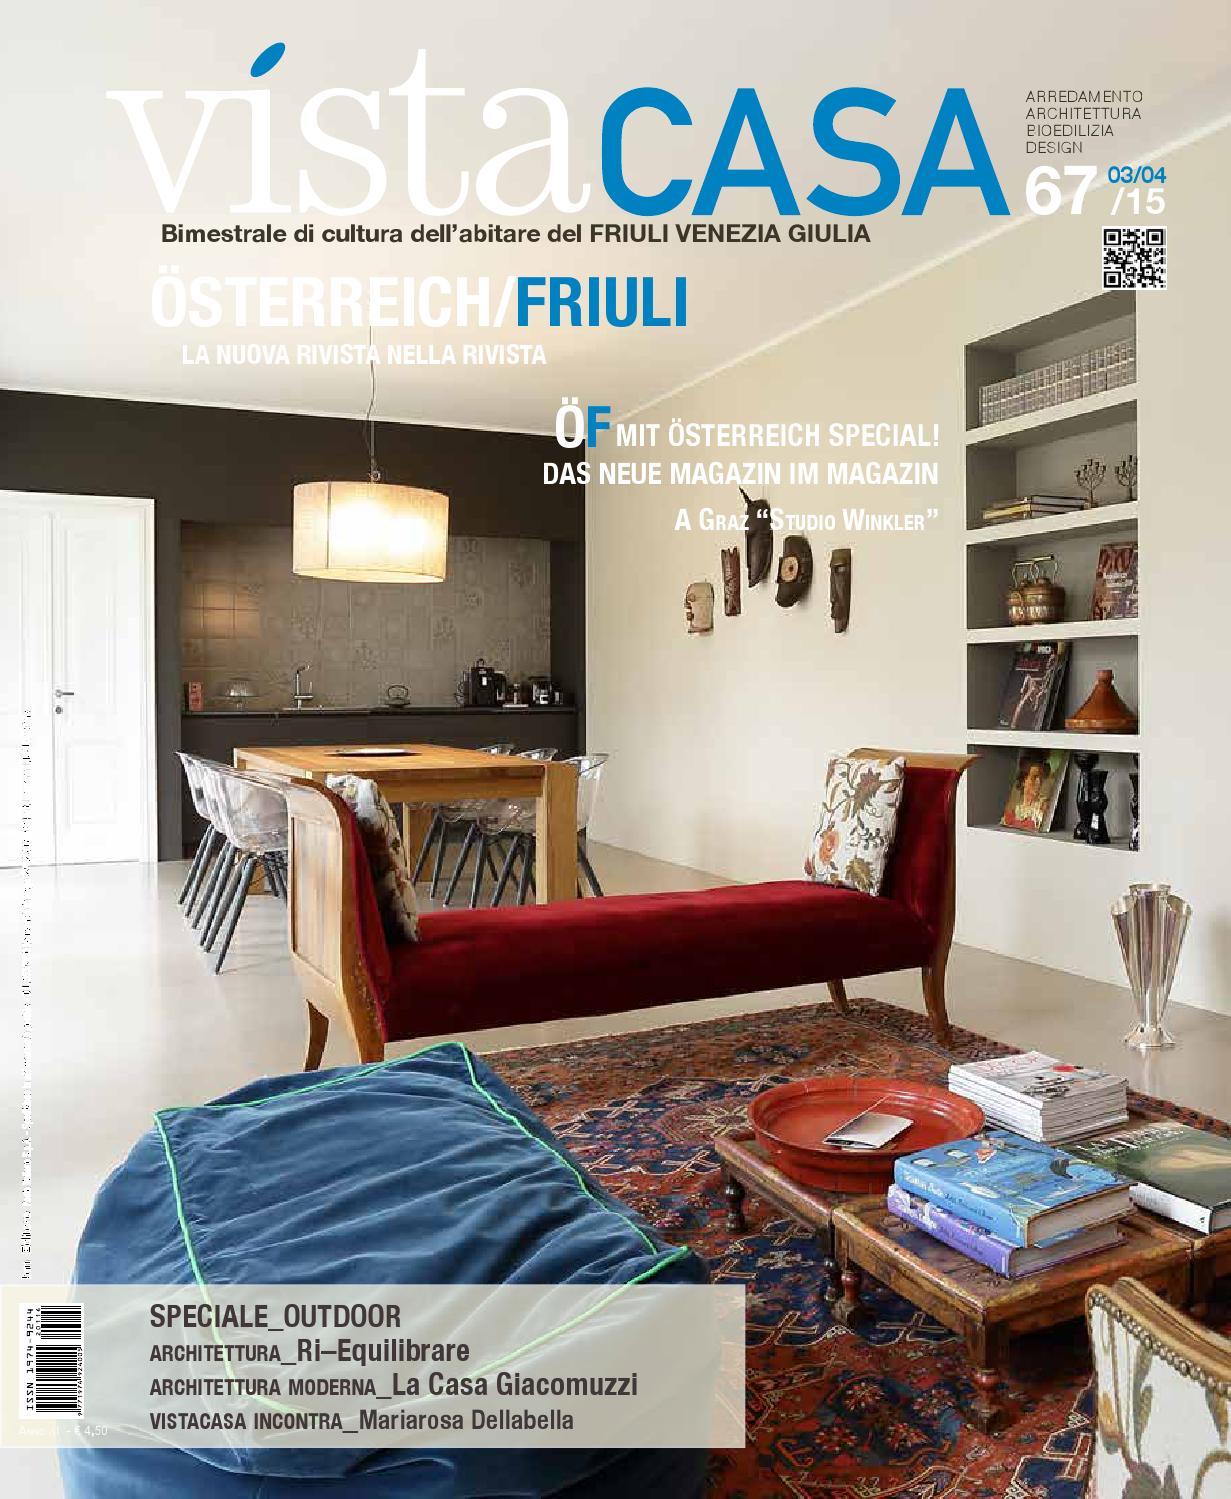 VistaCASA N°67 by Vistacasa by BM Editore - issuu